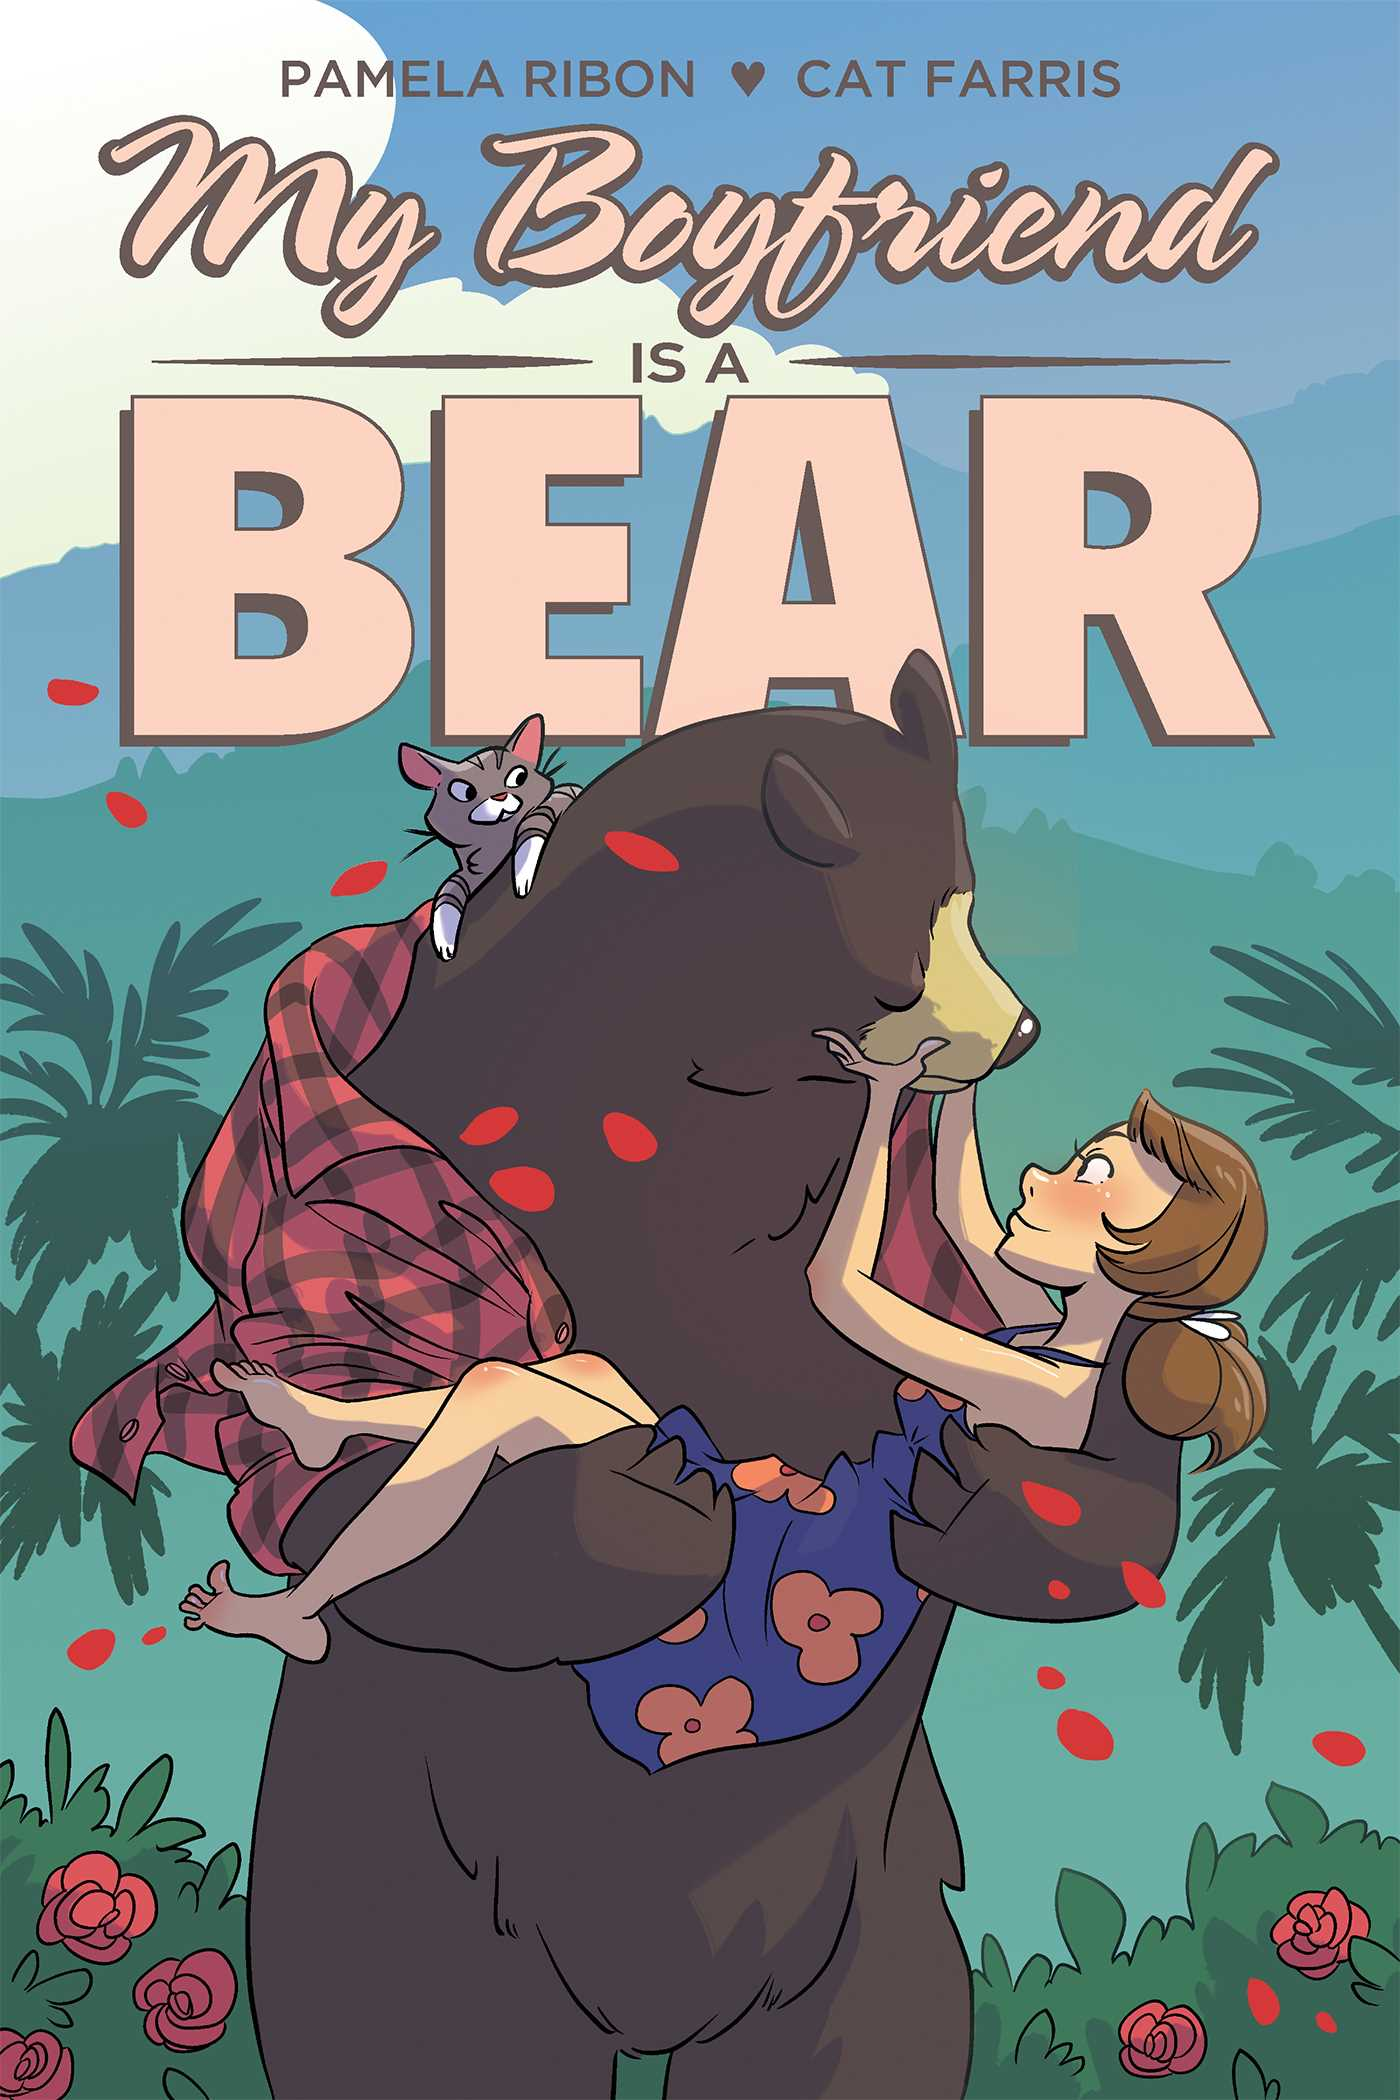 my boyfriend is a bear book by pamela ribon cat farris official